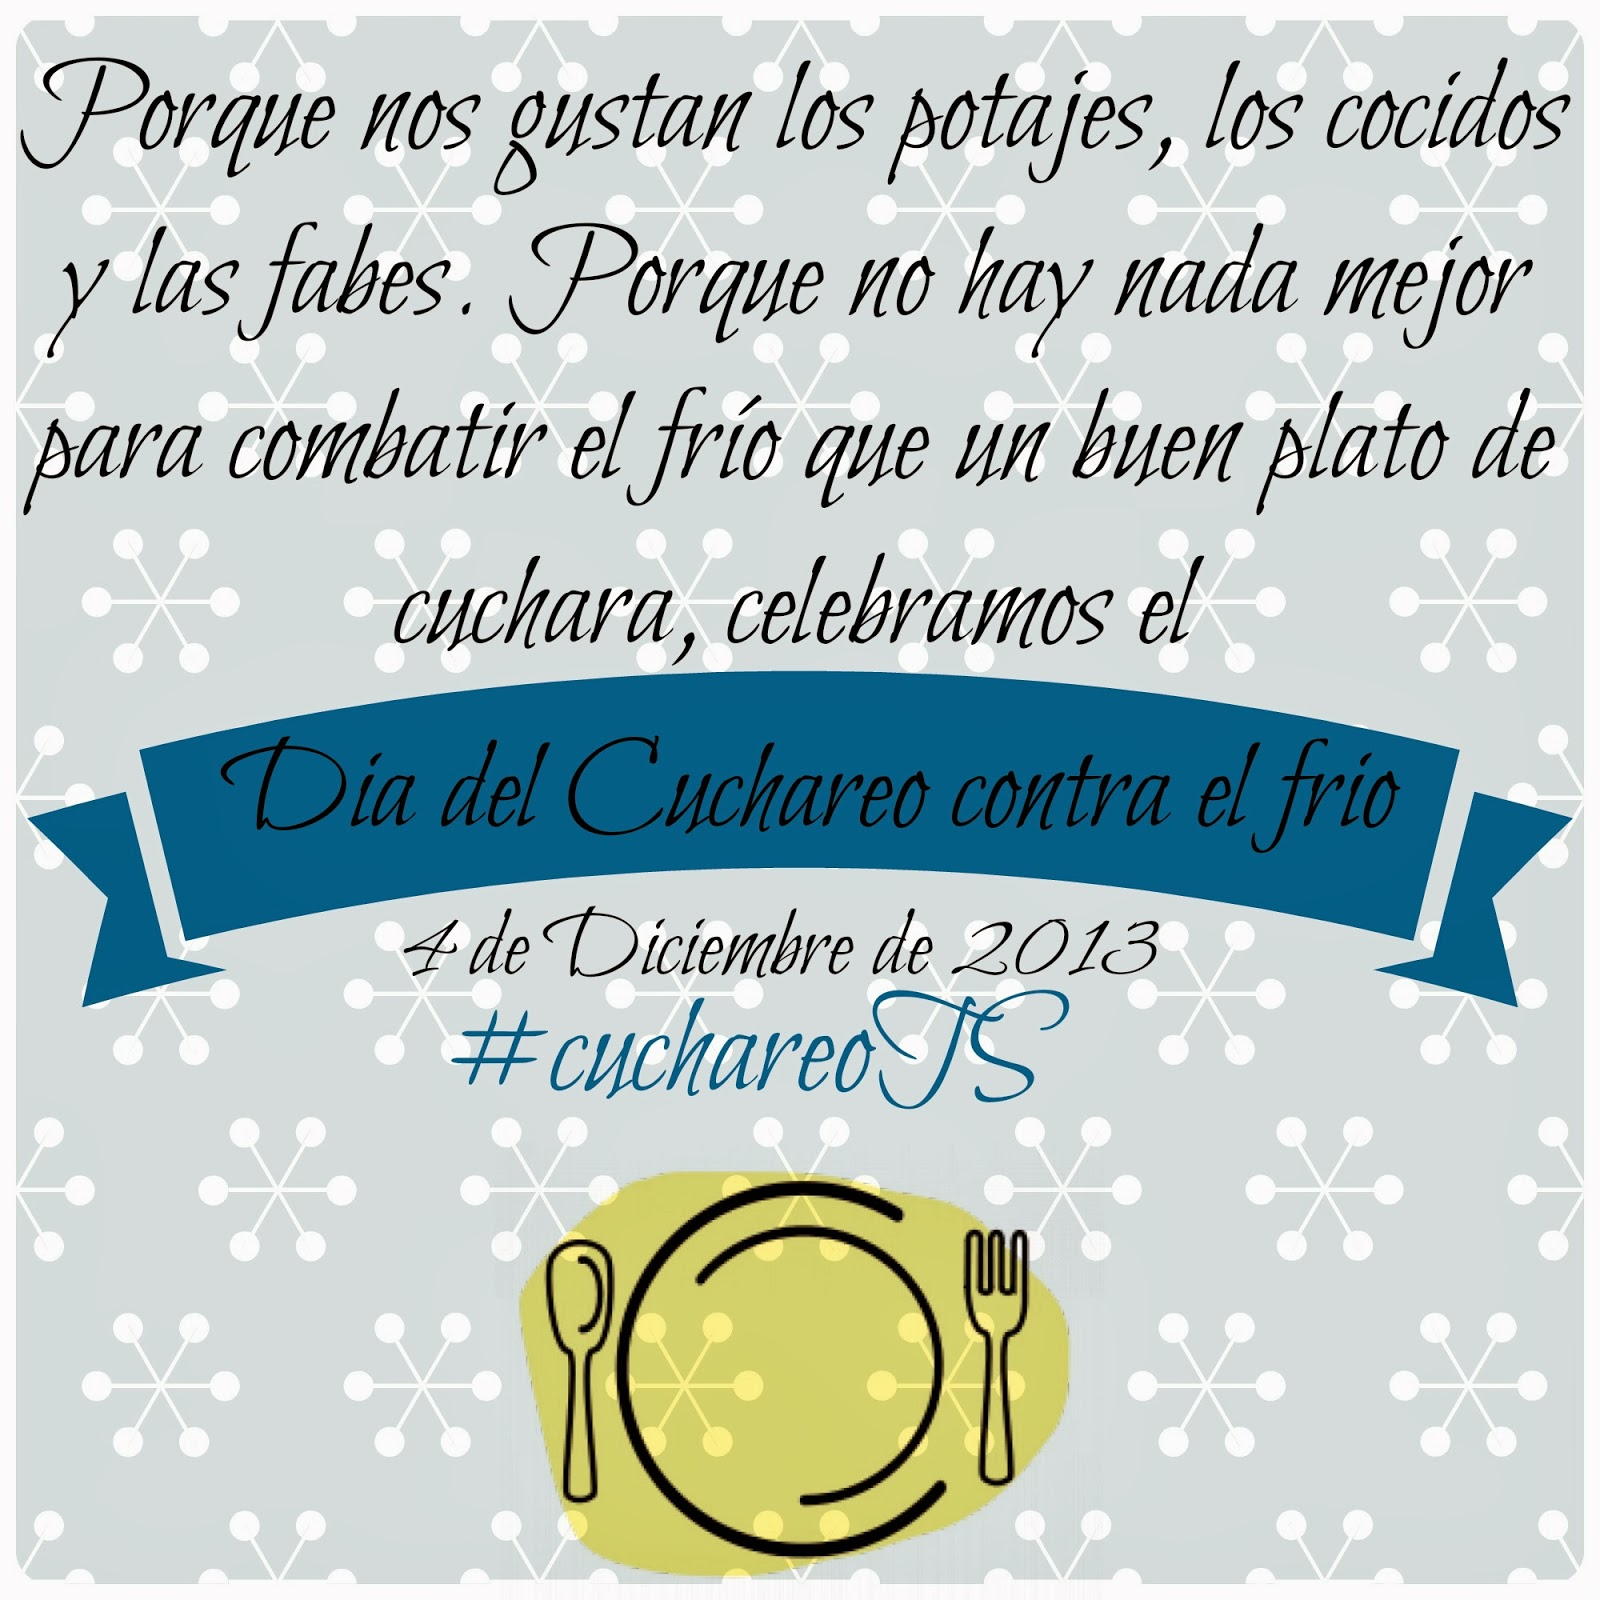 http://lacocinats.blogspot.com/2013/11/recopilatorio-de-recetas-del-dia-del.html